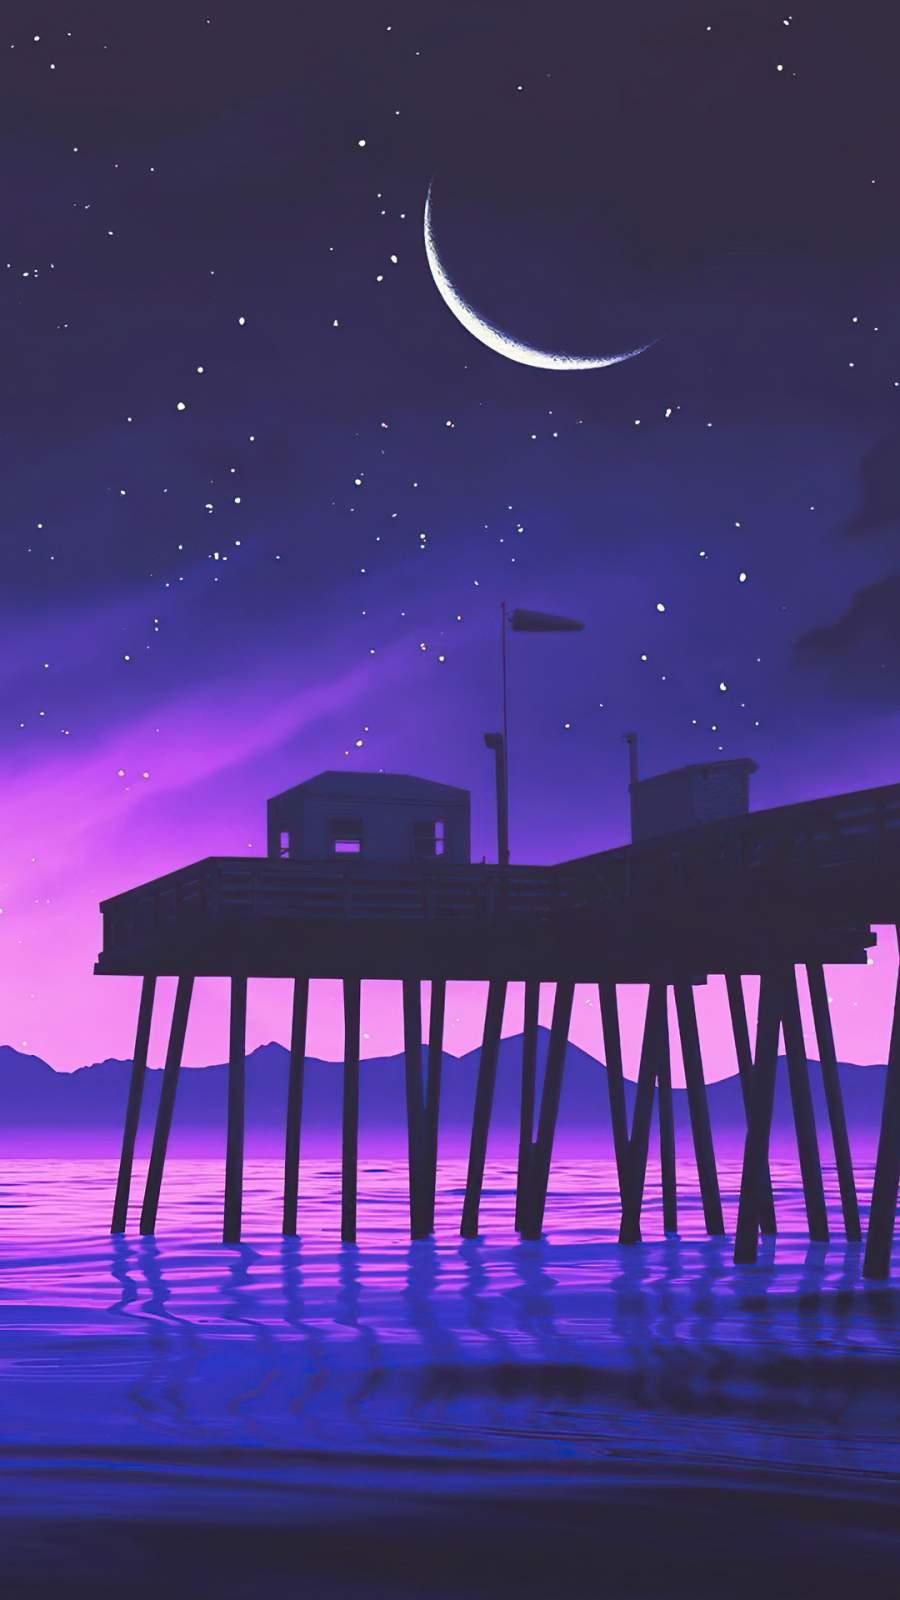 Pier House iPhone Wallpaper